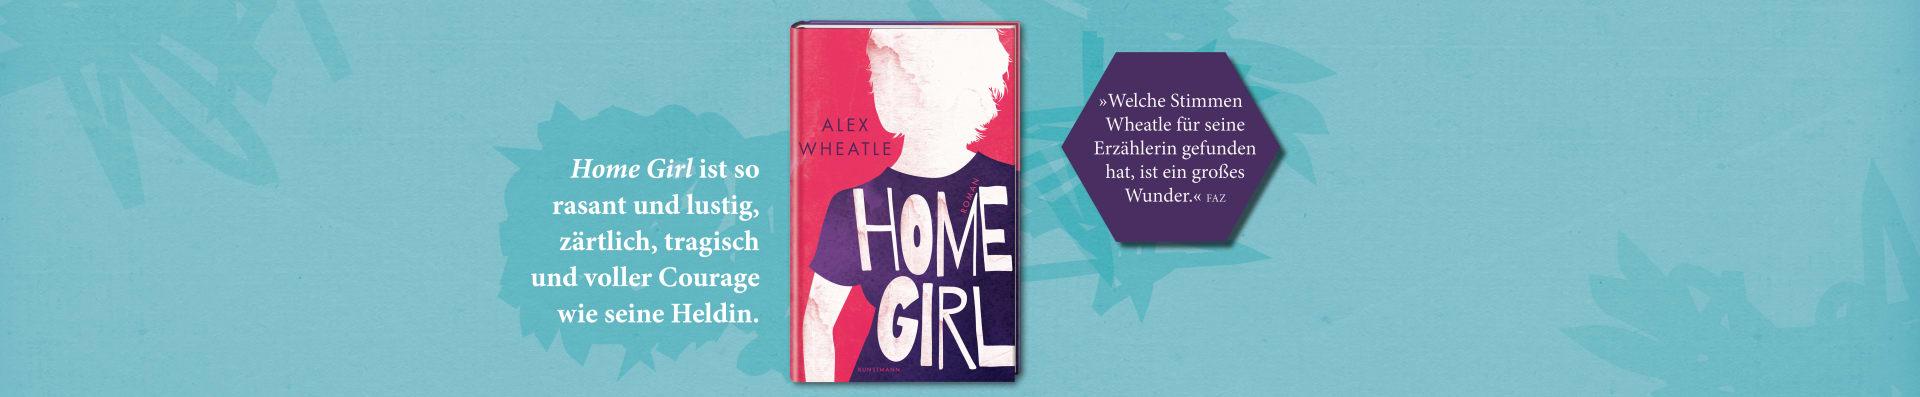 Alex Wheatle – Home Girl